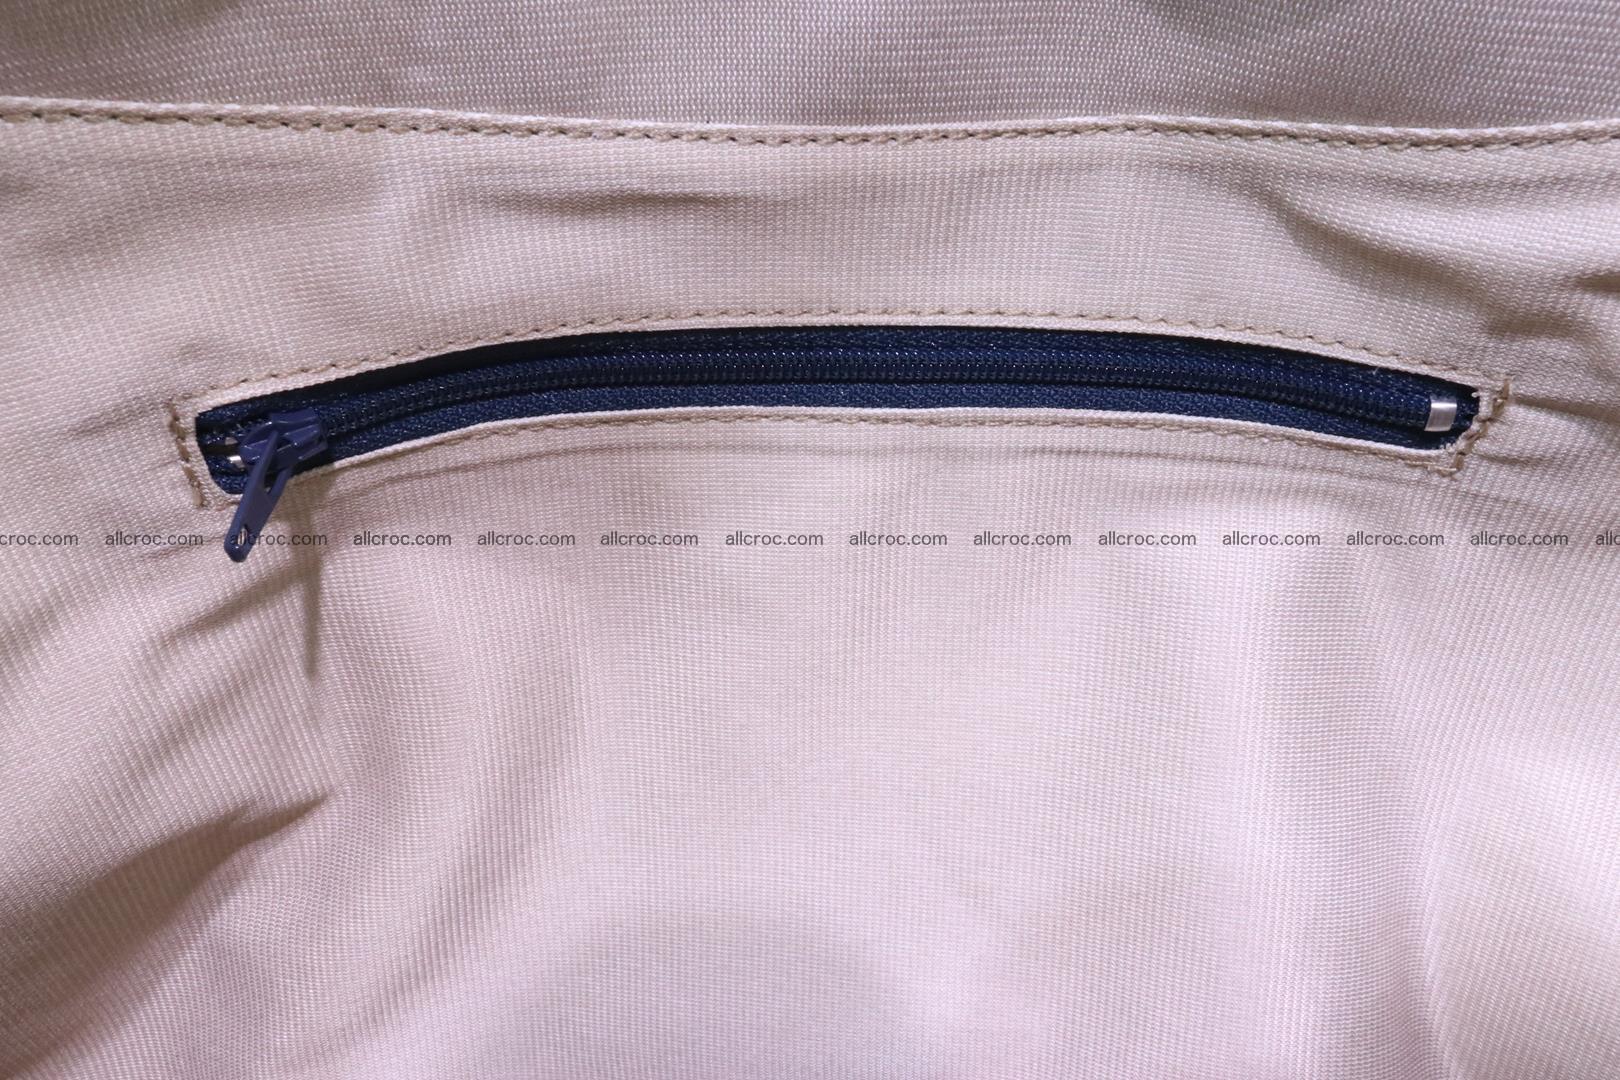 Cobra skin ladies handbag with head of cobra 194 Foto 15